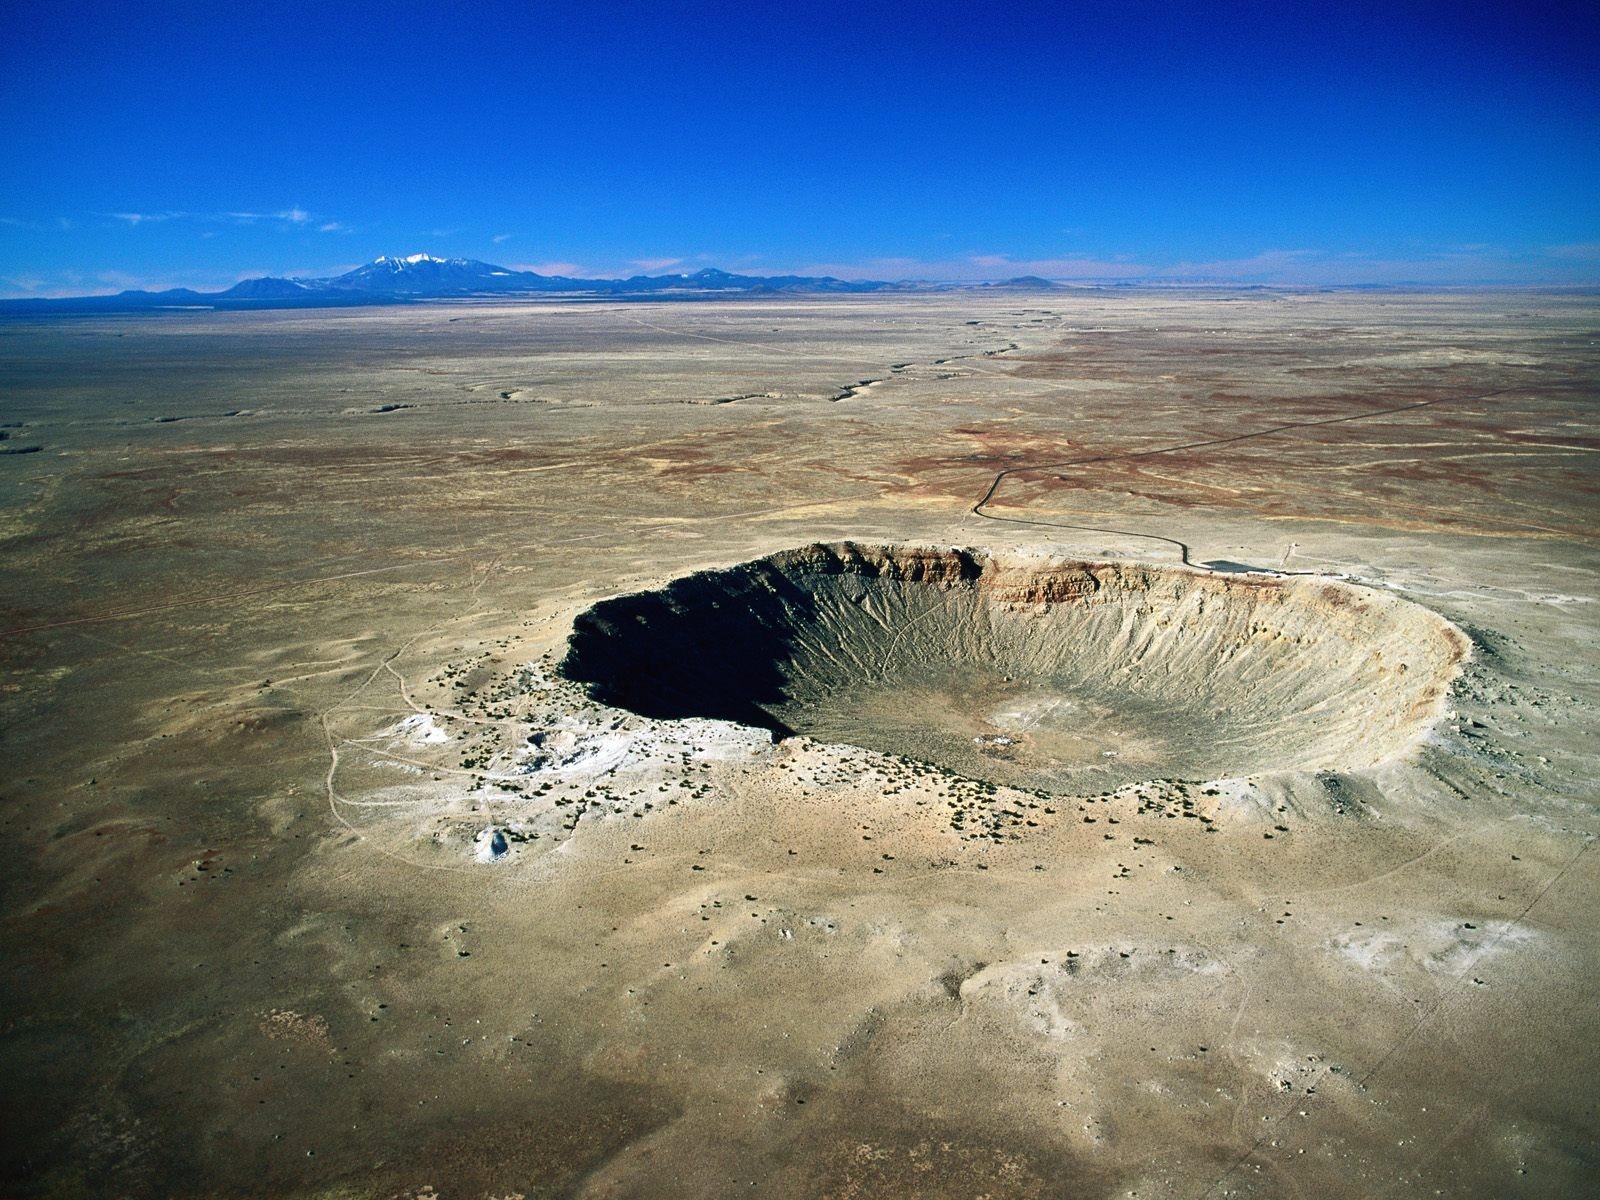 arizona-meteor-crater-desert